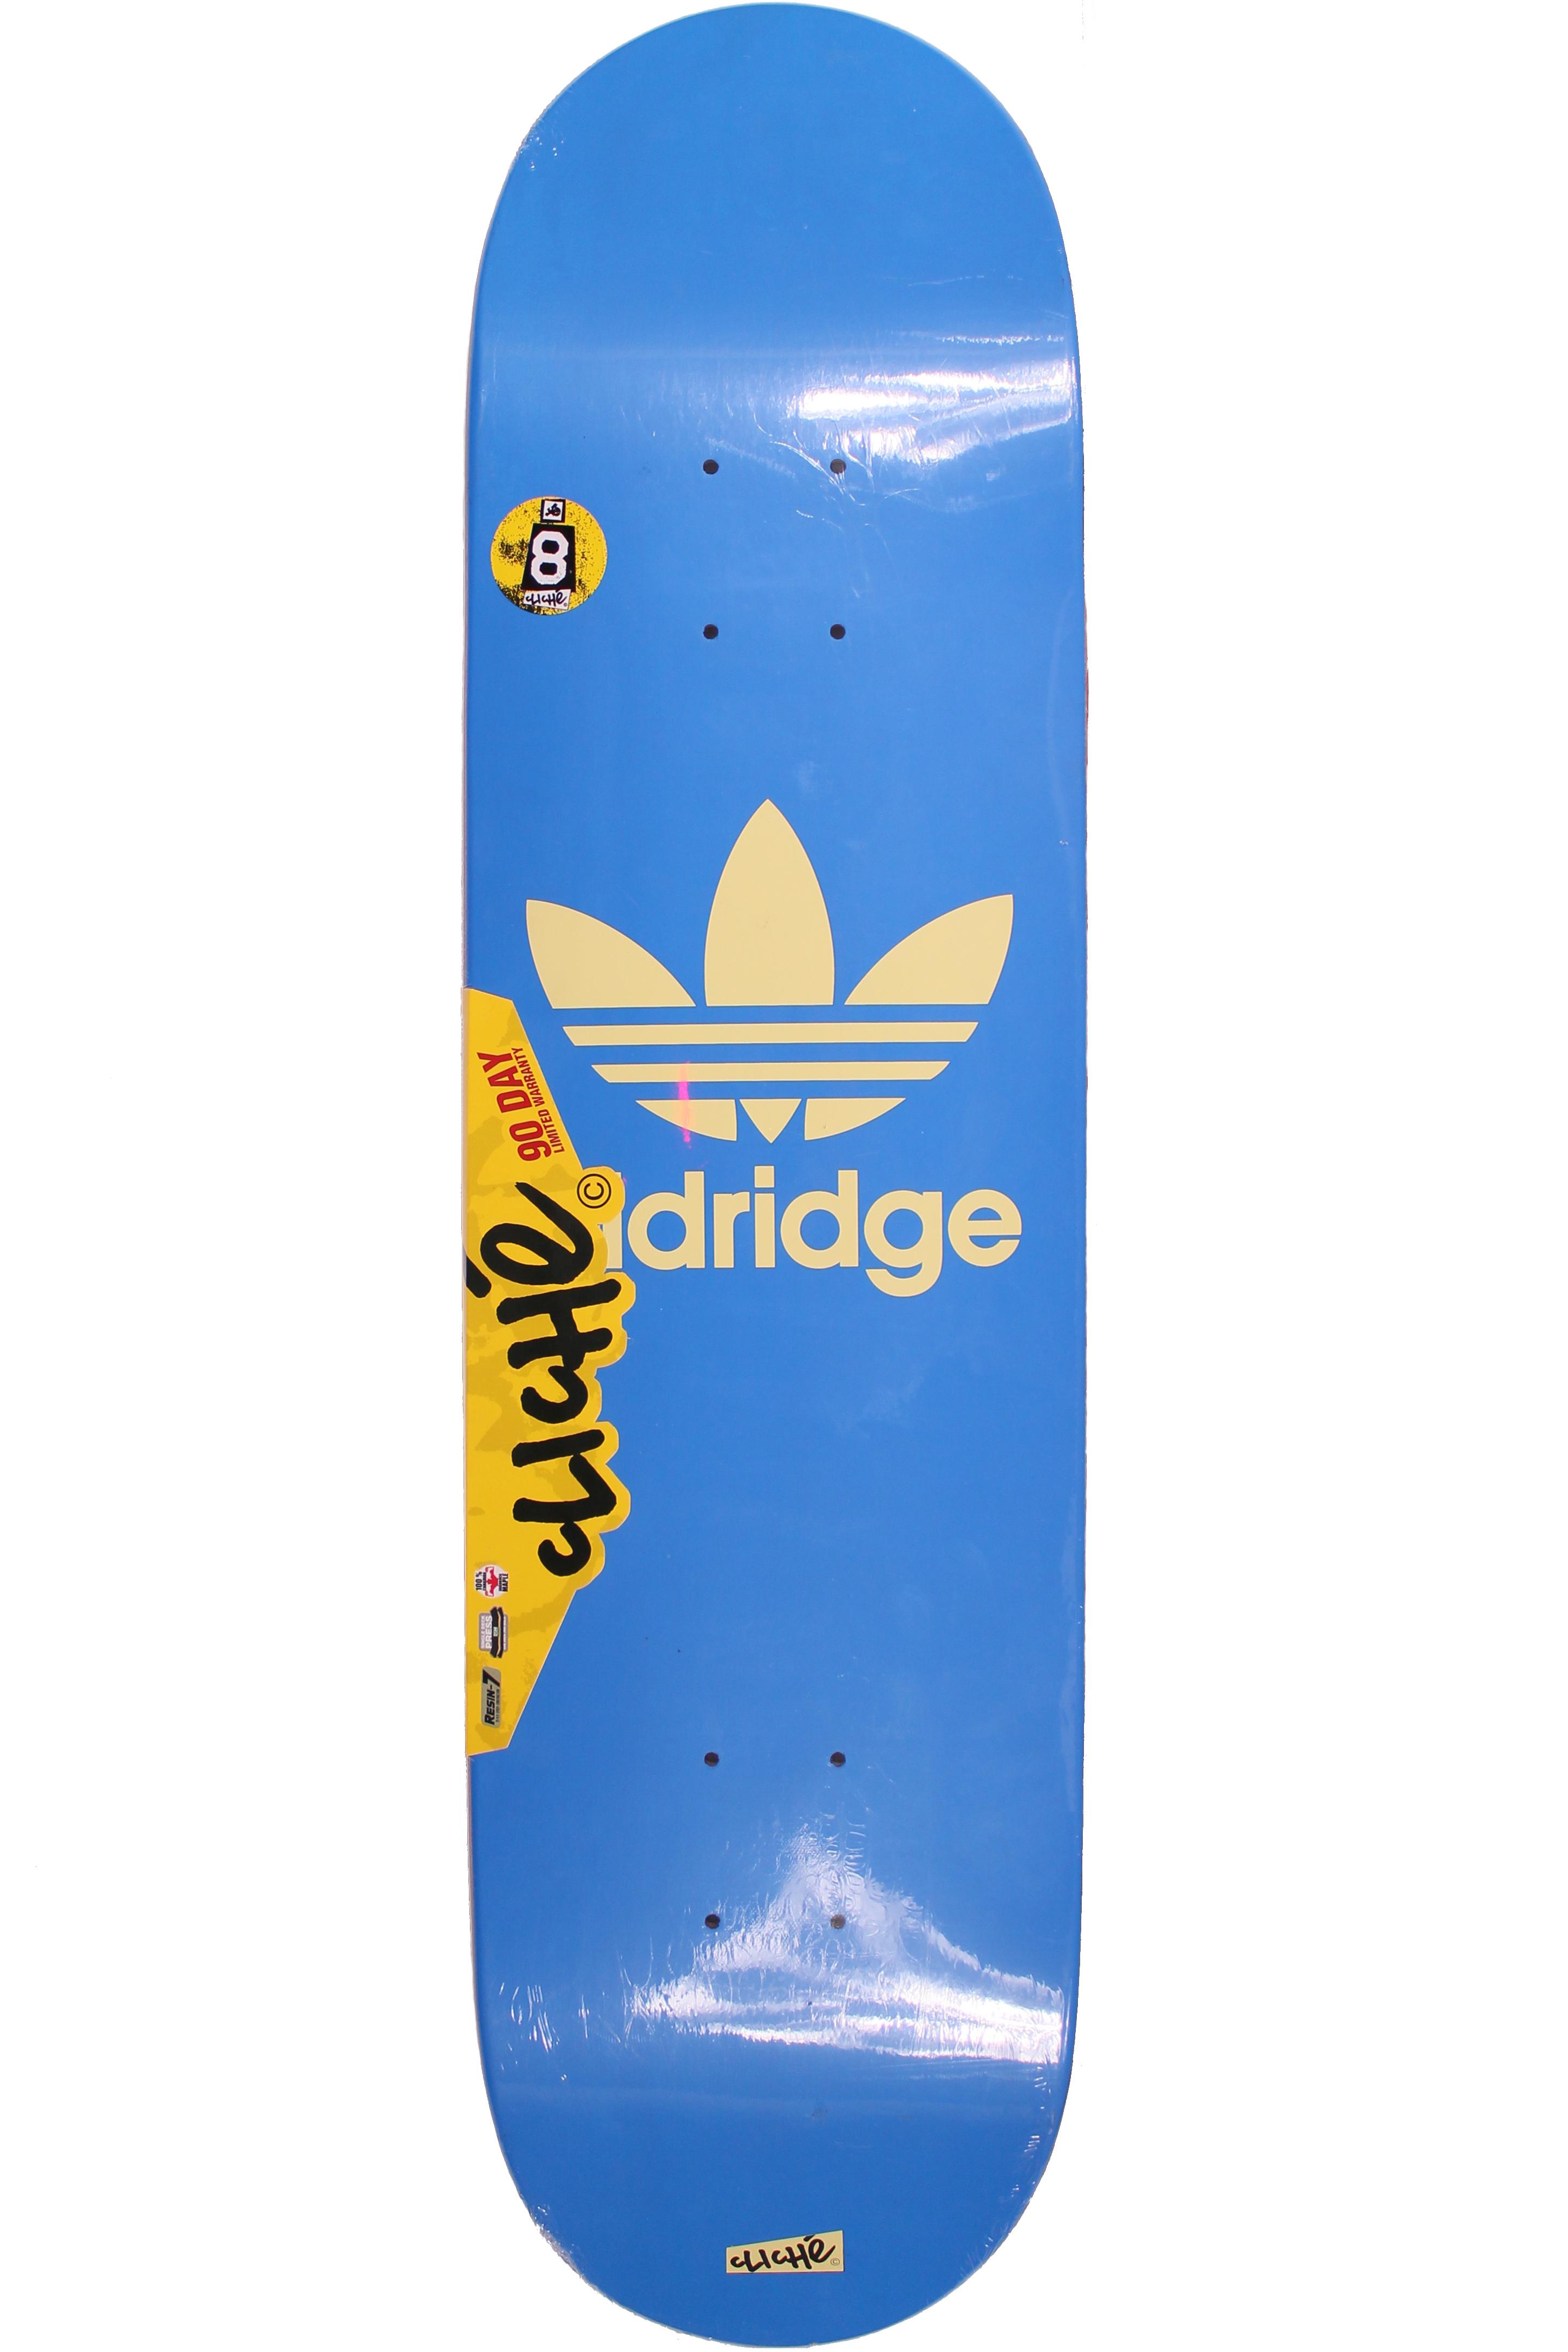 Deska Cliche Eldridge Adidas Originals Blue